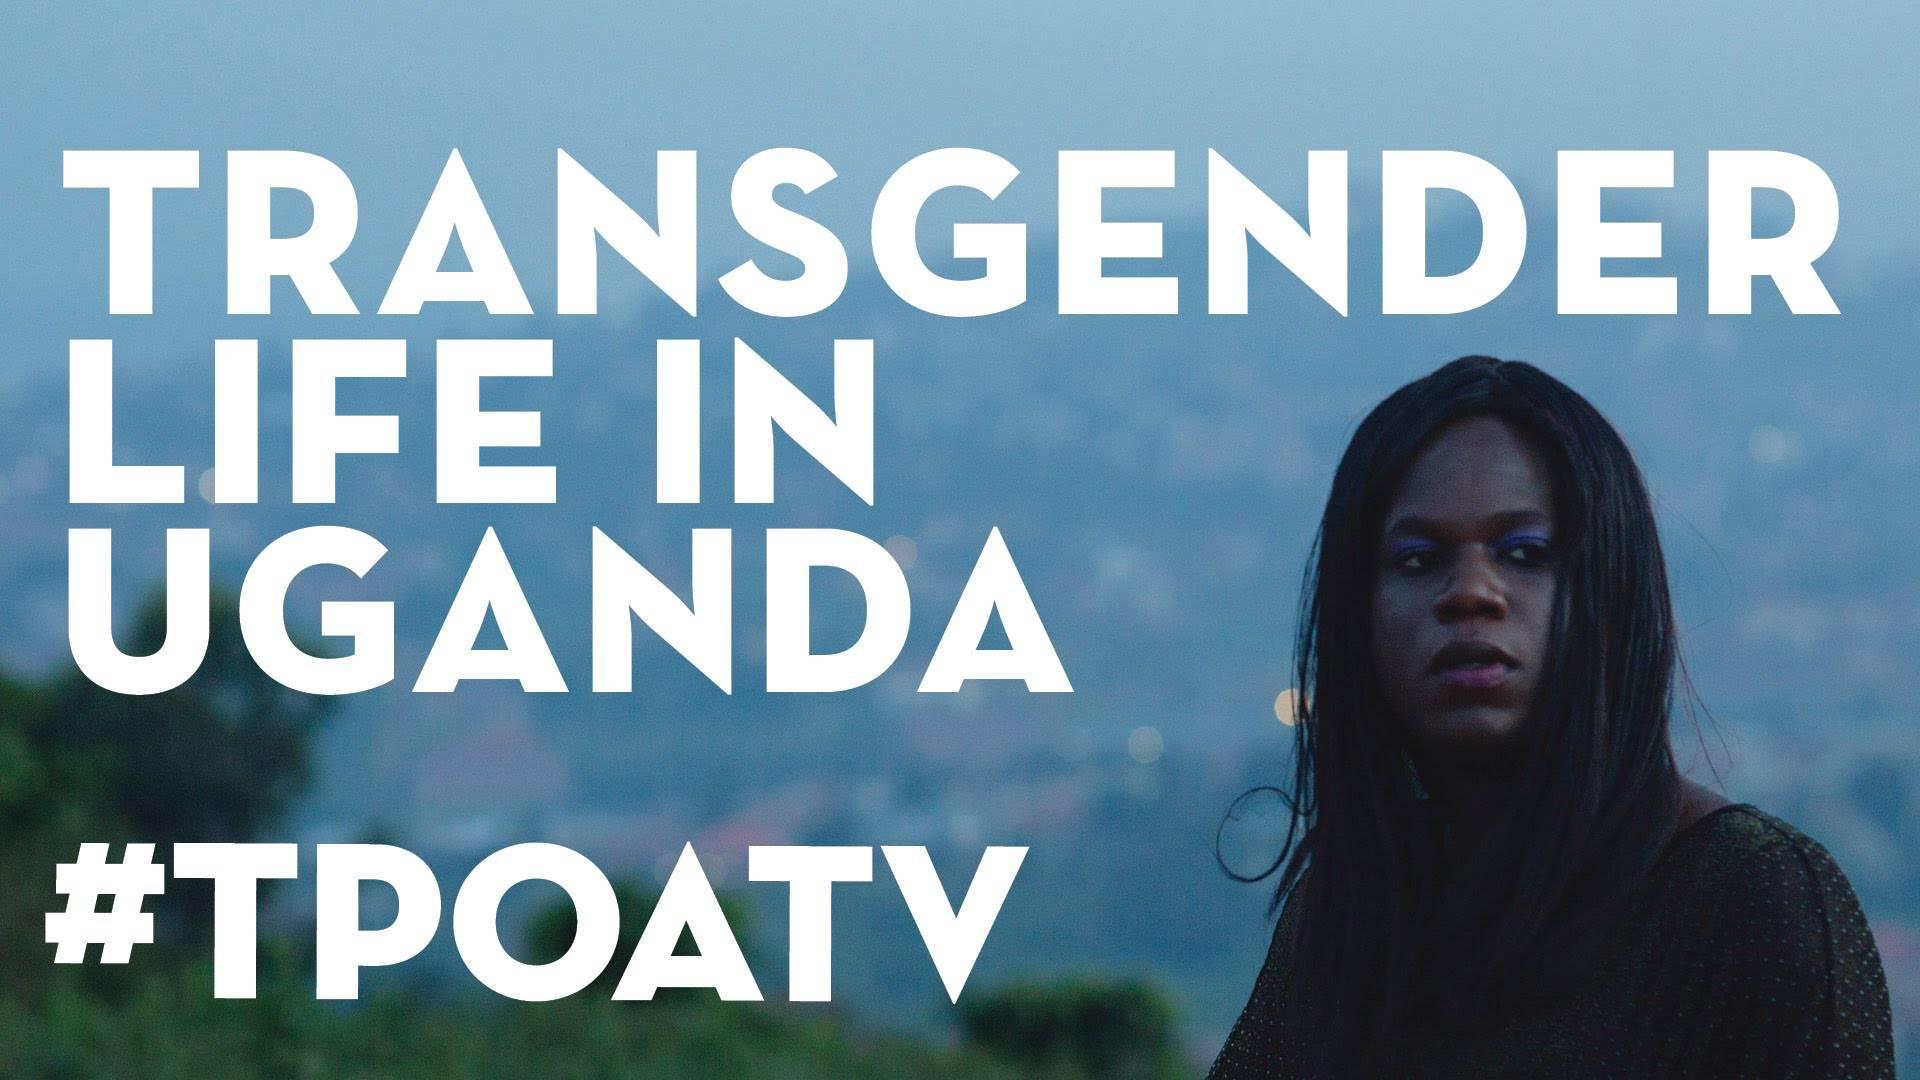 The Pearl of Africa Transgender Life Stories in Uganda